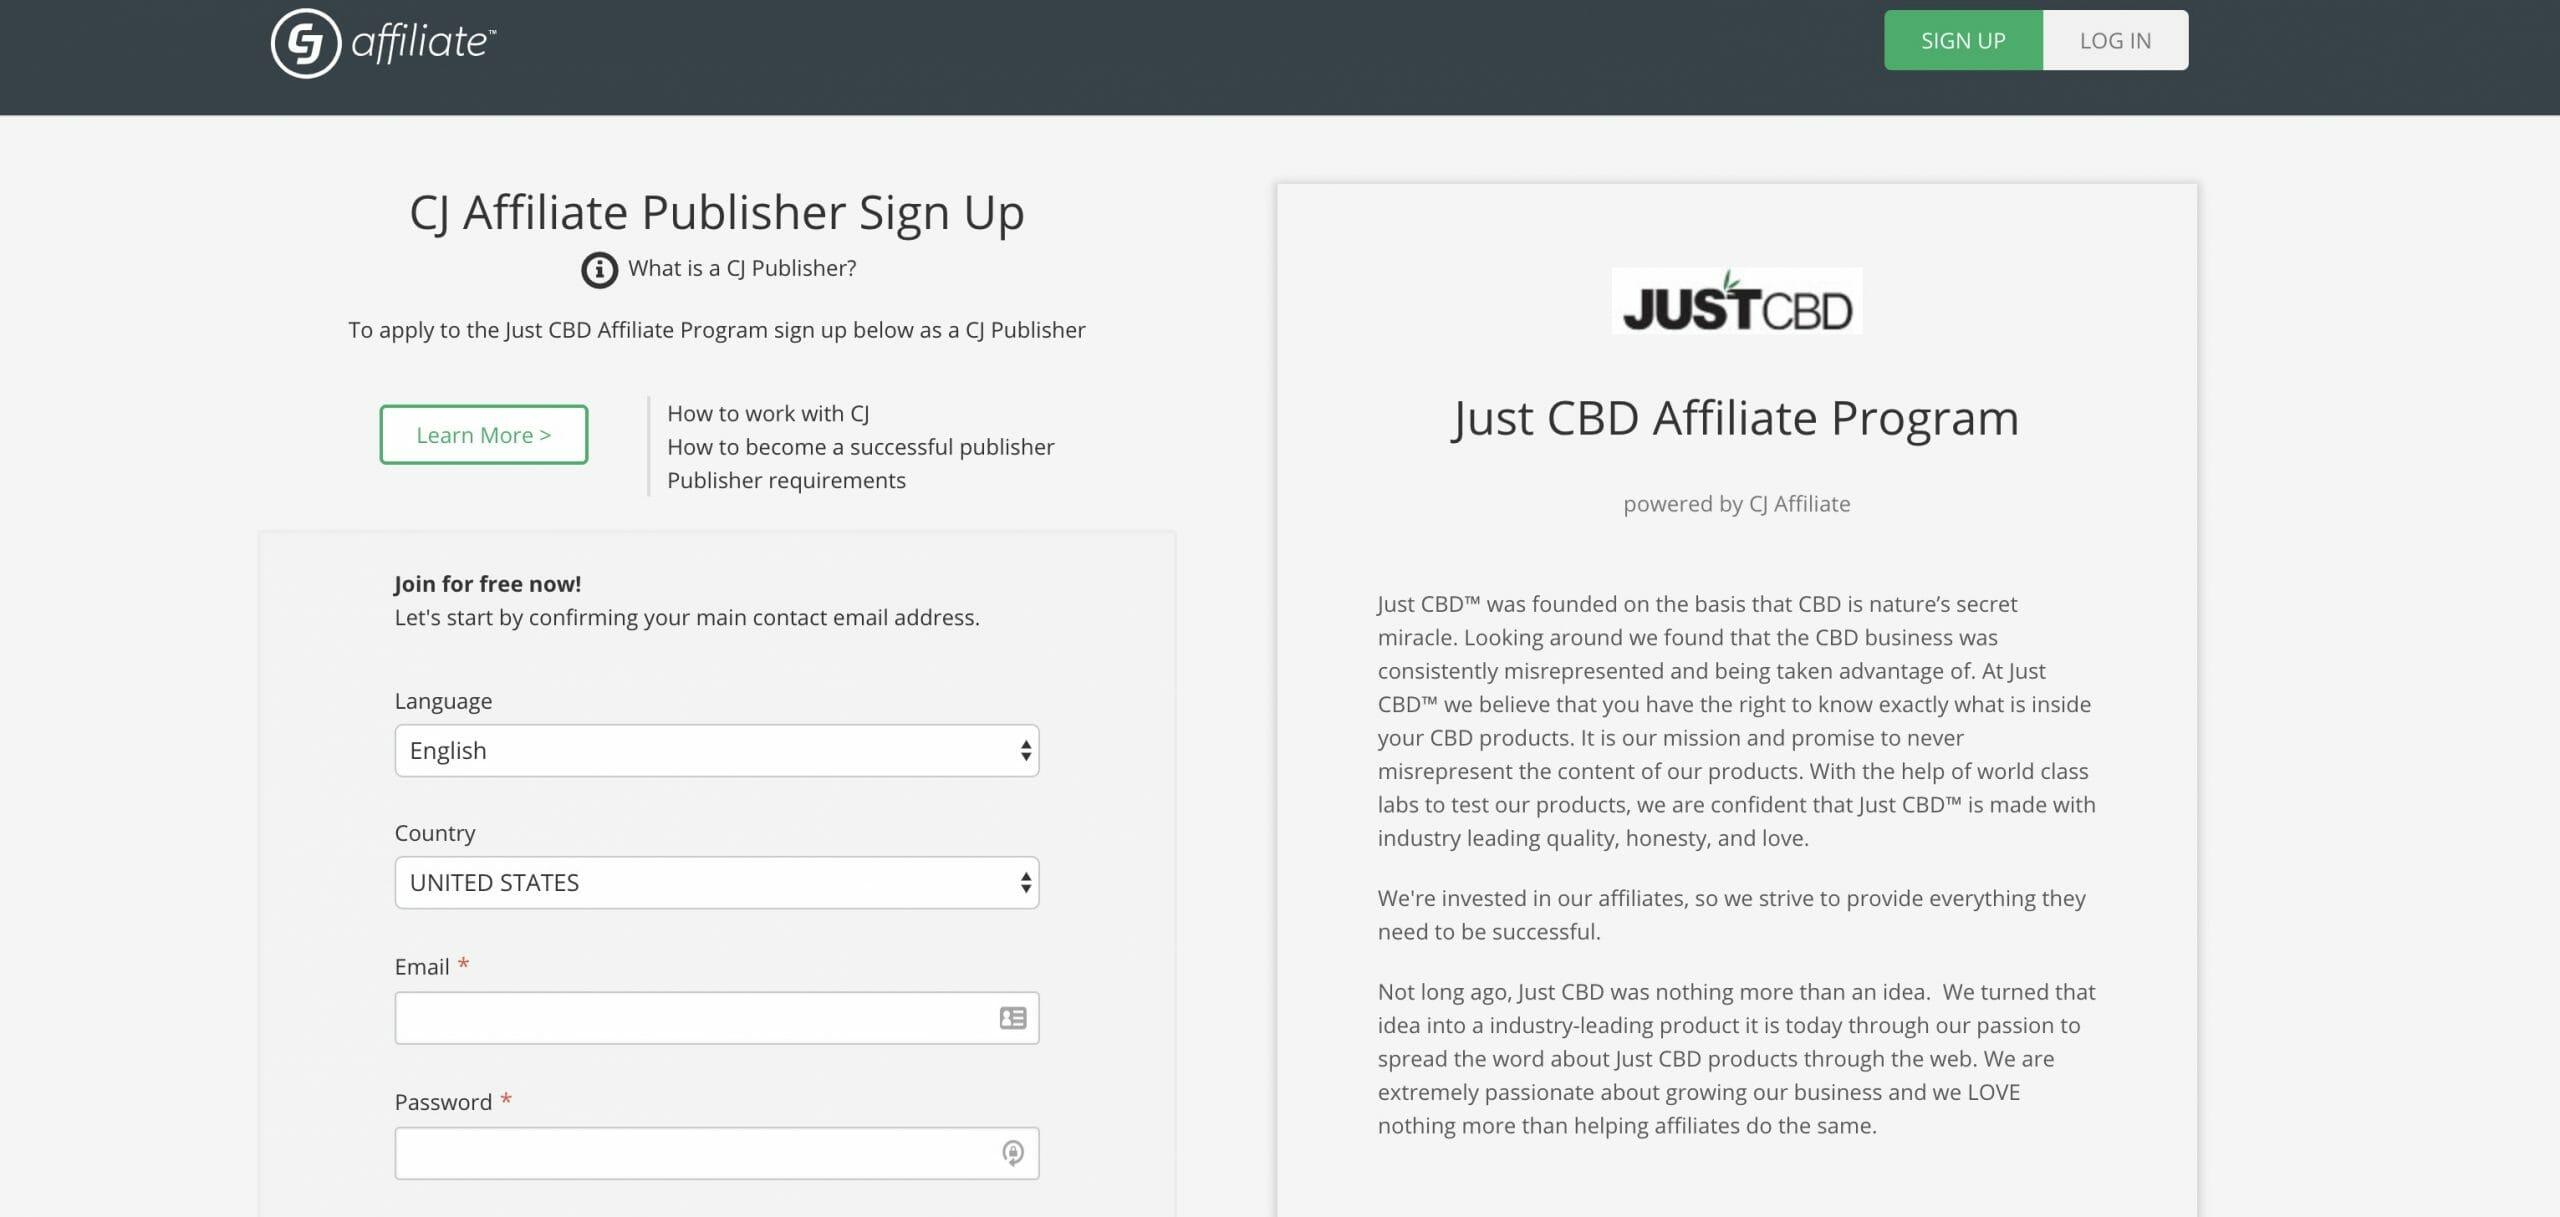 JustCBD Affiliate Program